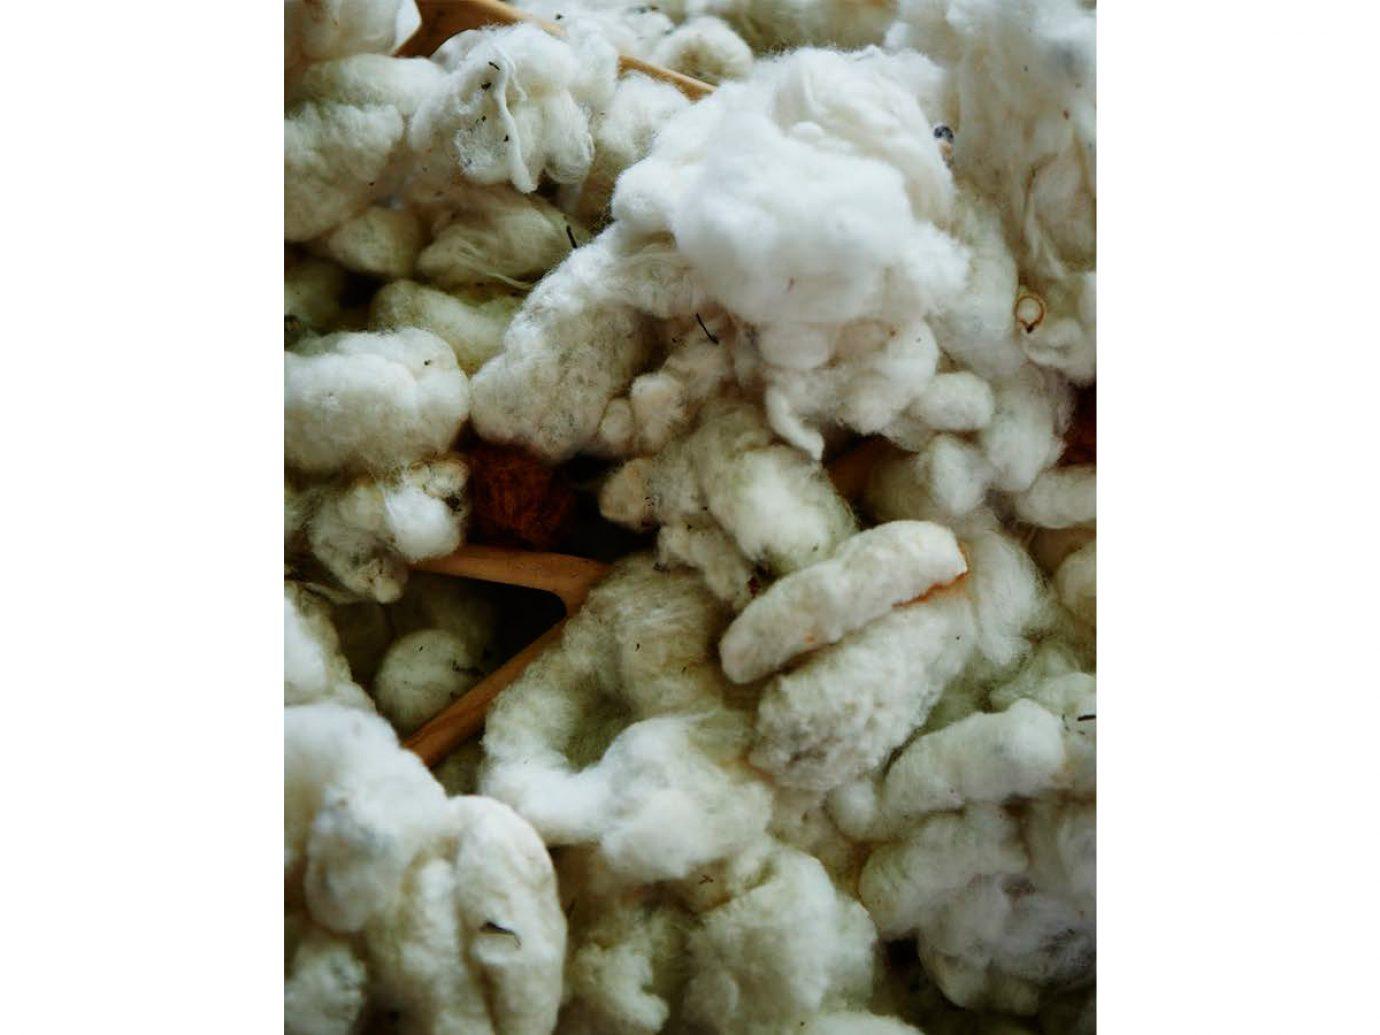 Trip Ideas food produce vegetable Seafood dish cruciferous vegetables cauliflower different